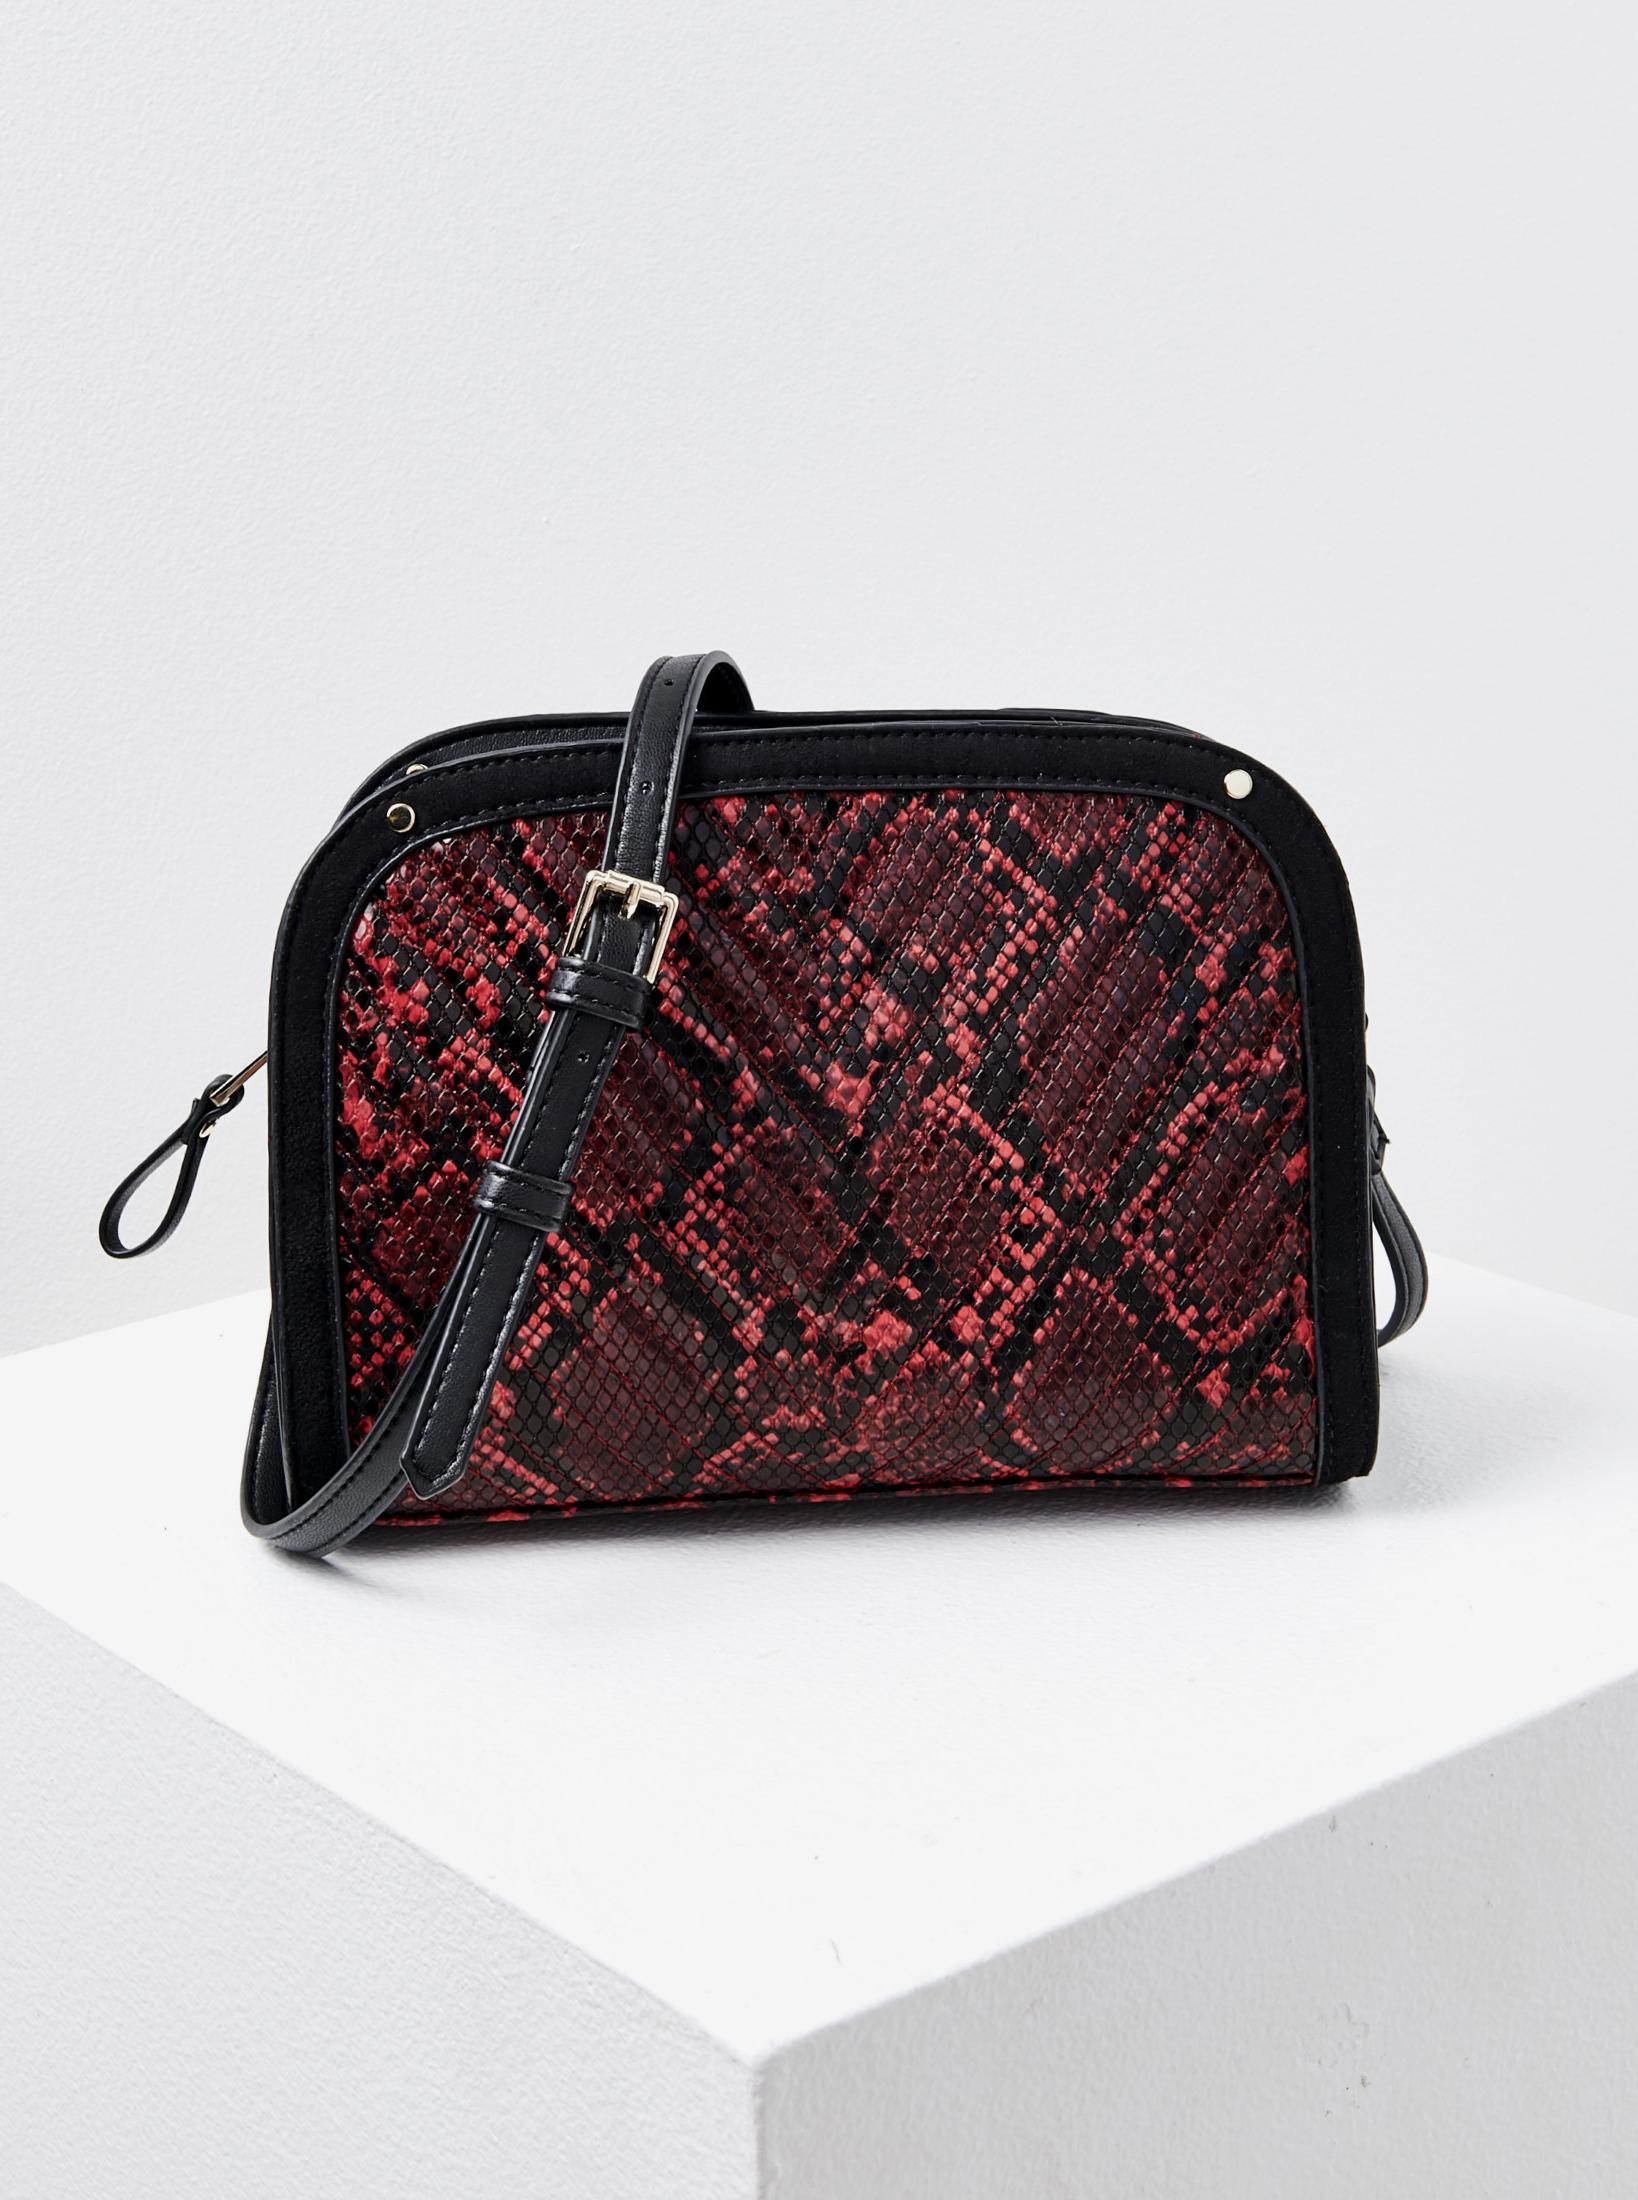 Černo-červená crossbody kabelka s hadím vzorem CAMAIEU